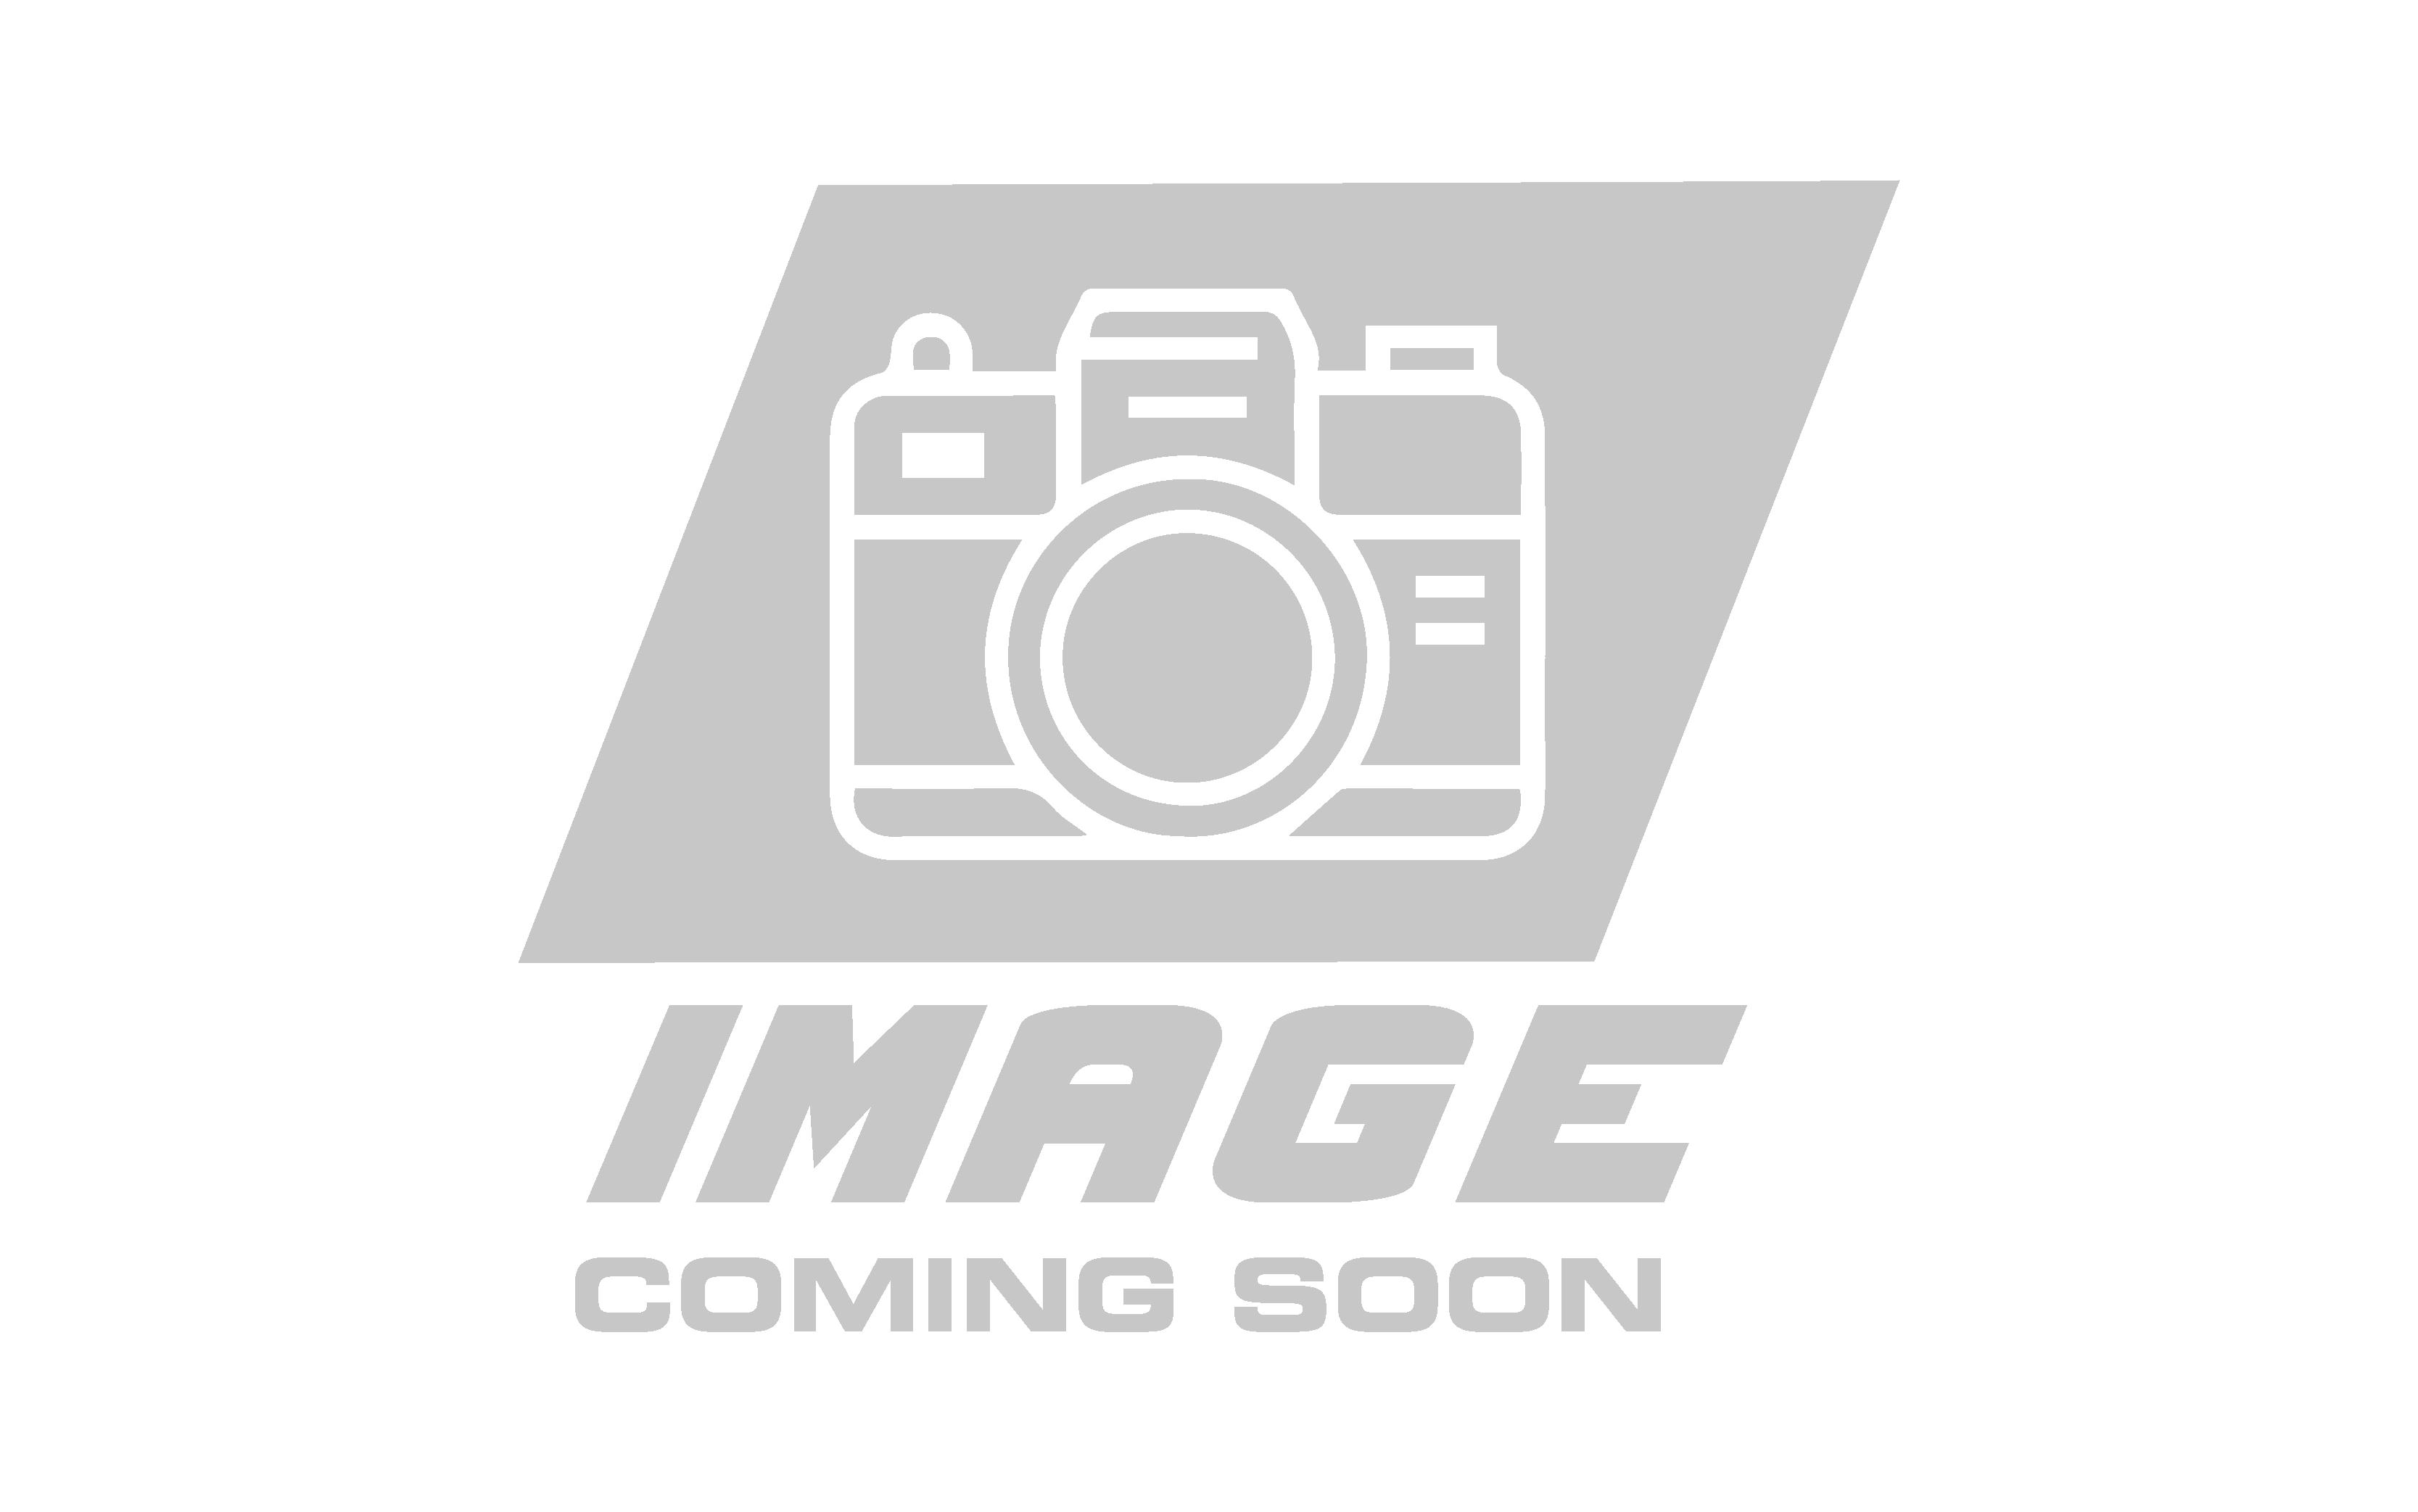 dodge_chevrolet_gmc_van_air_lift_loadlifter_5000_ultimate_bag_88105